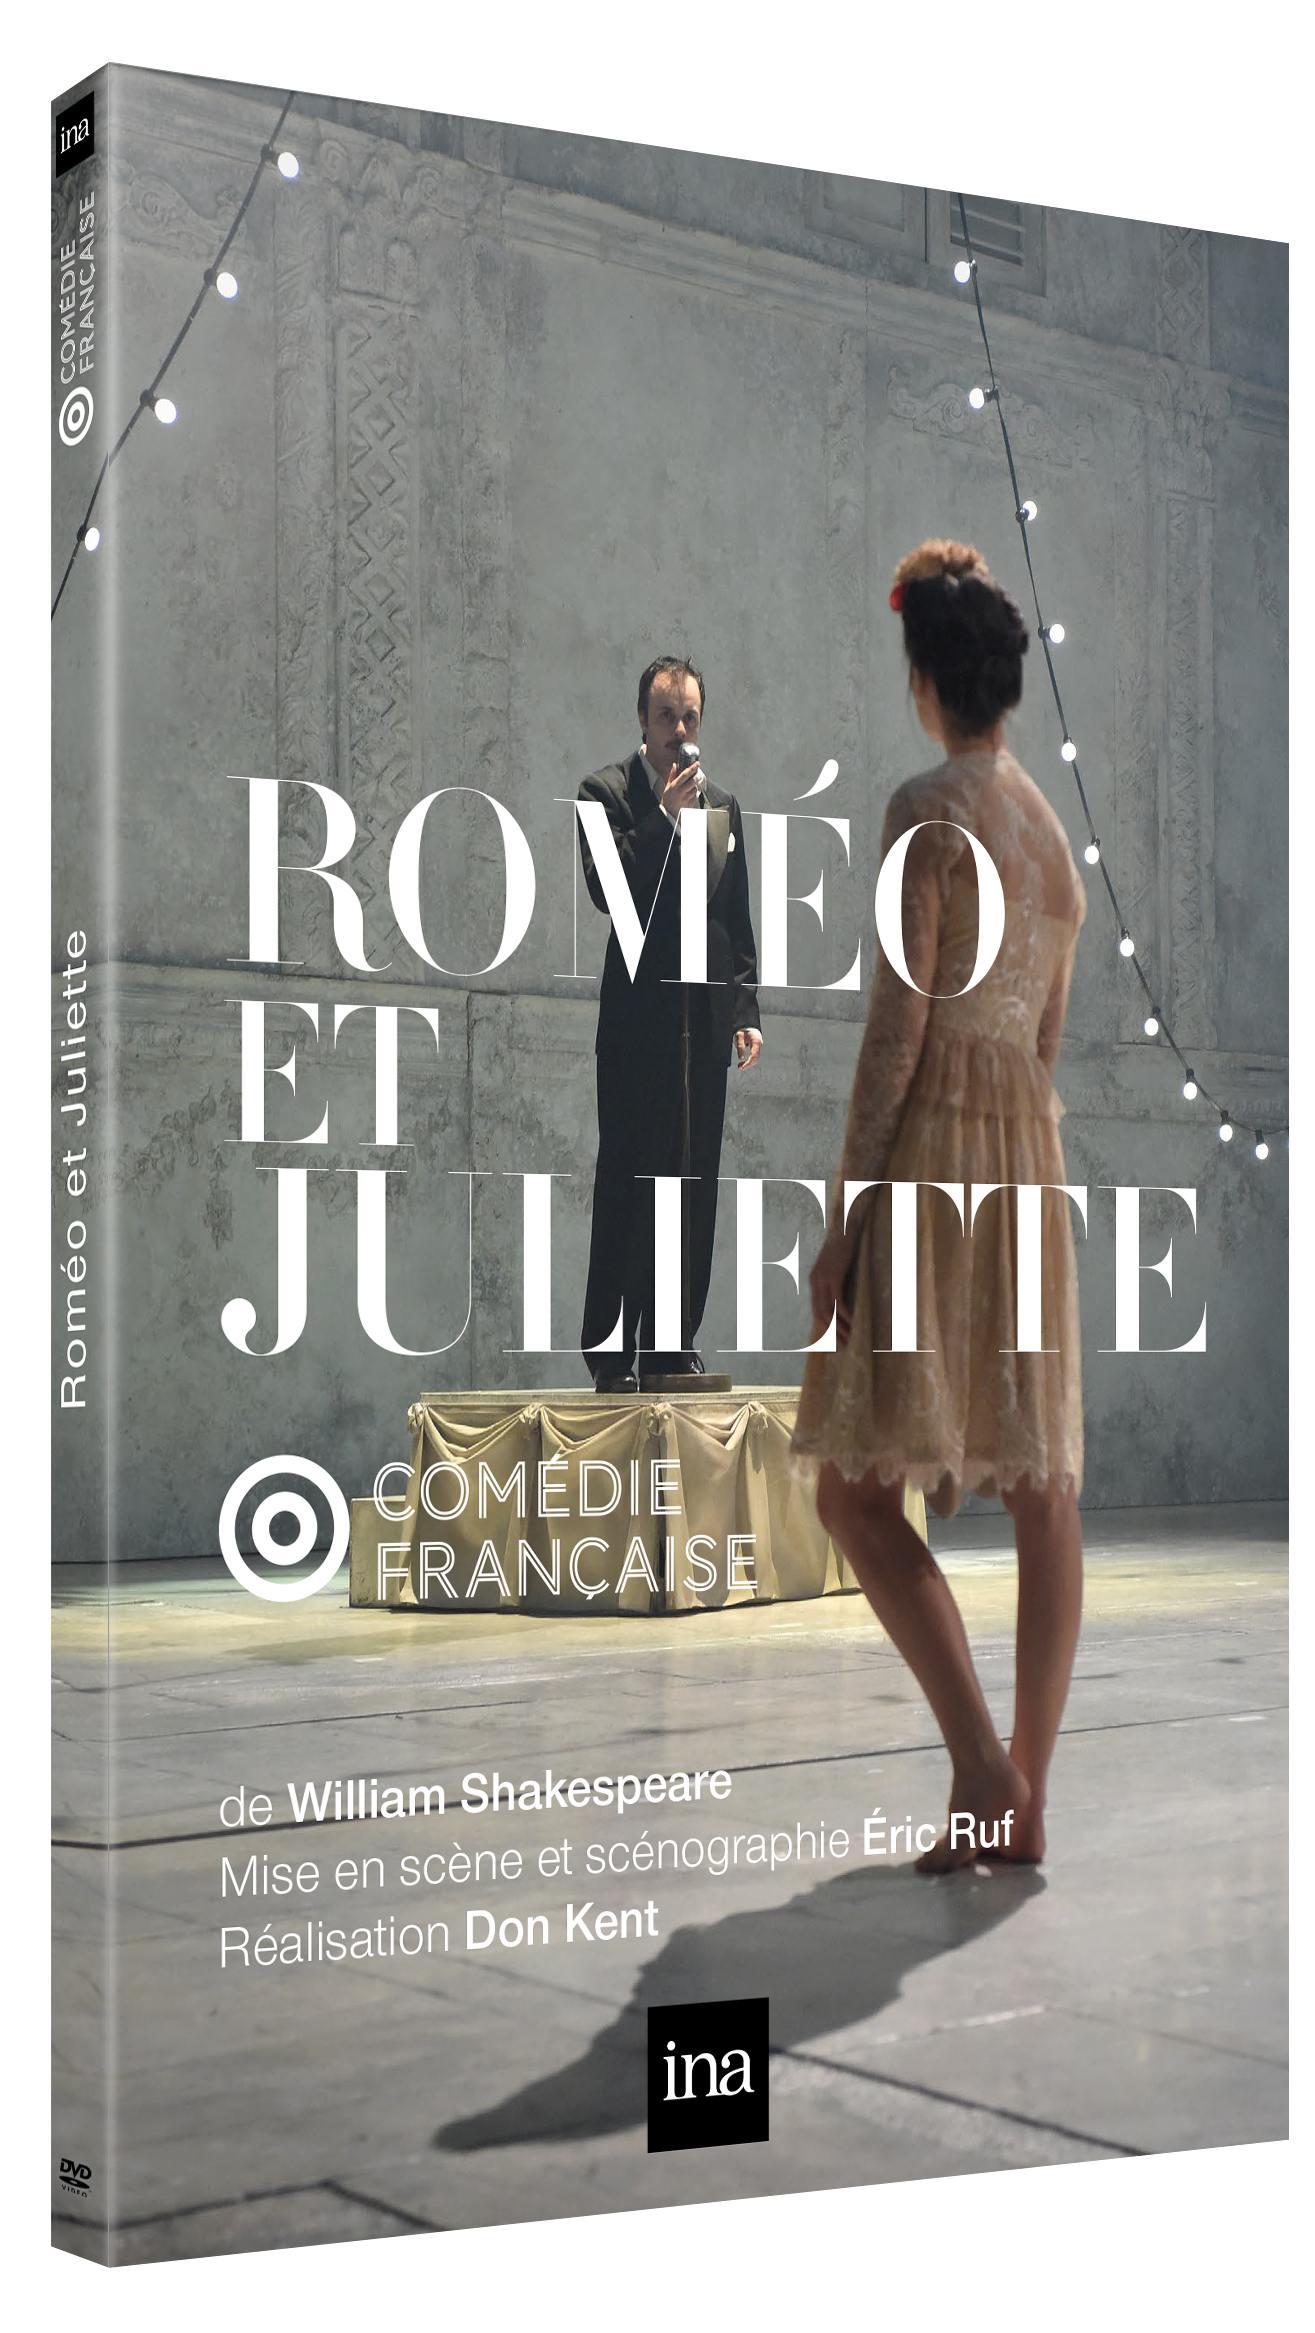 Romeo et juliette - dvd